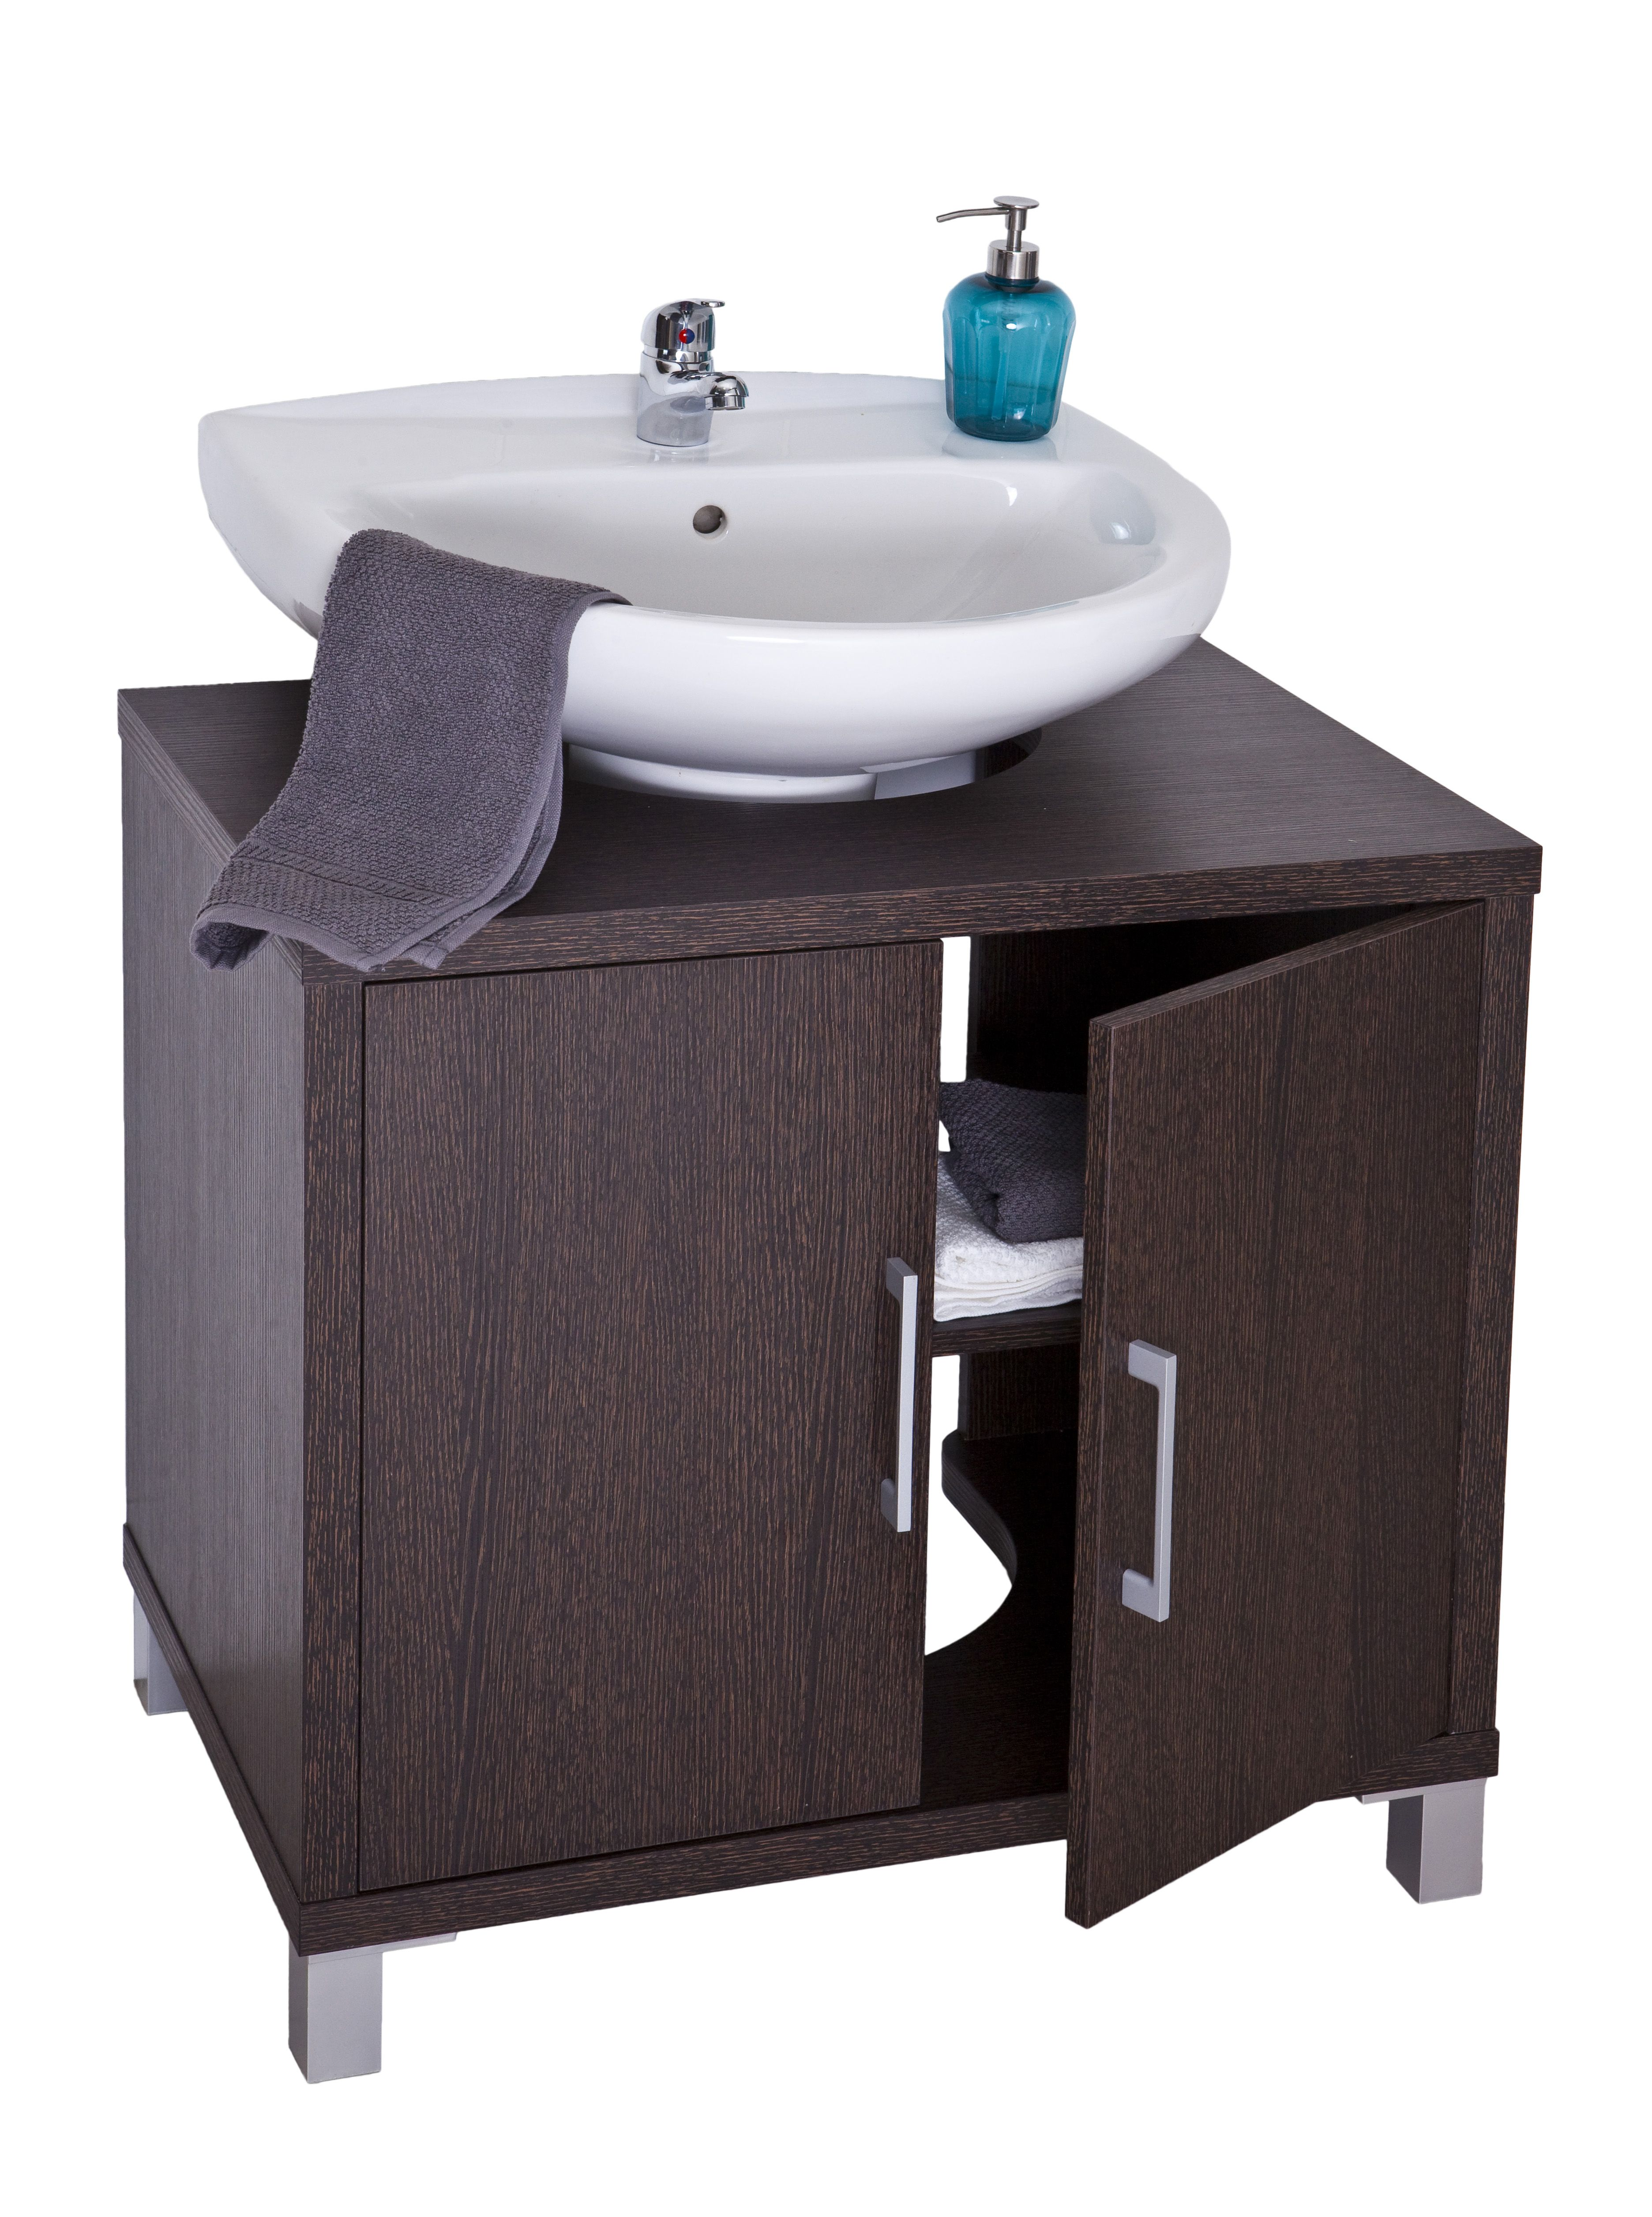 Muebles para el ba o en topkit topkit - Mueble de lavabo barato ...